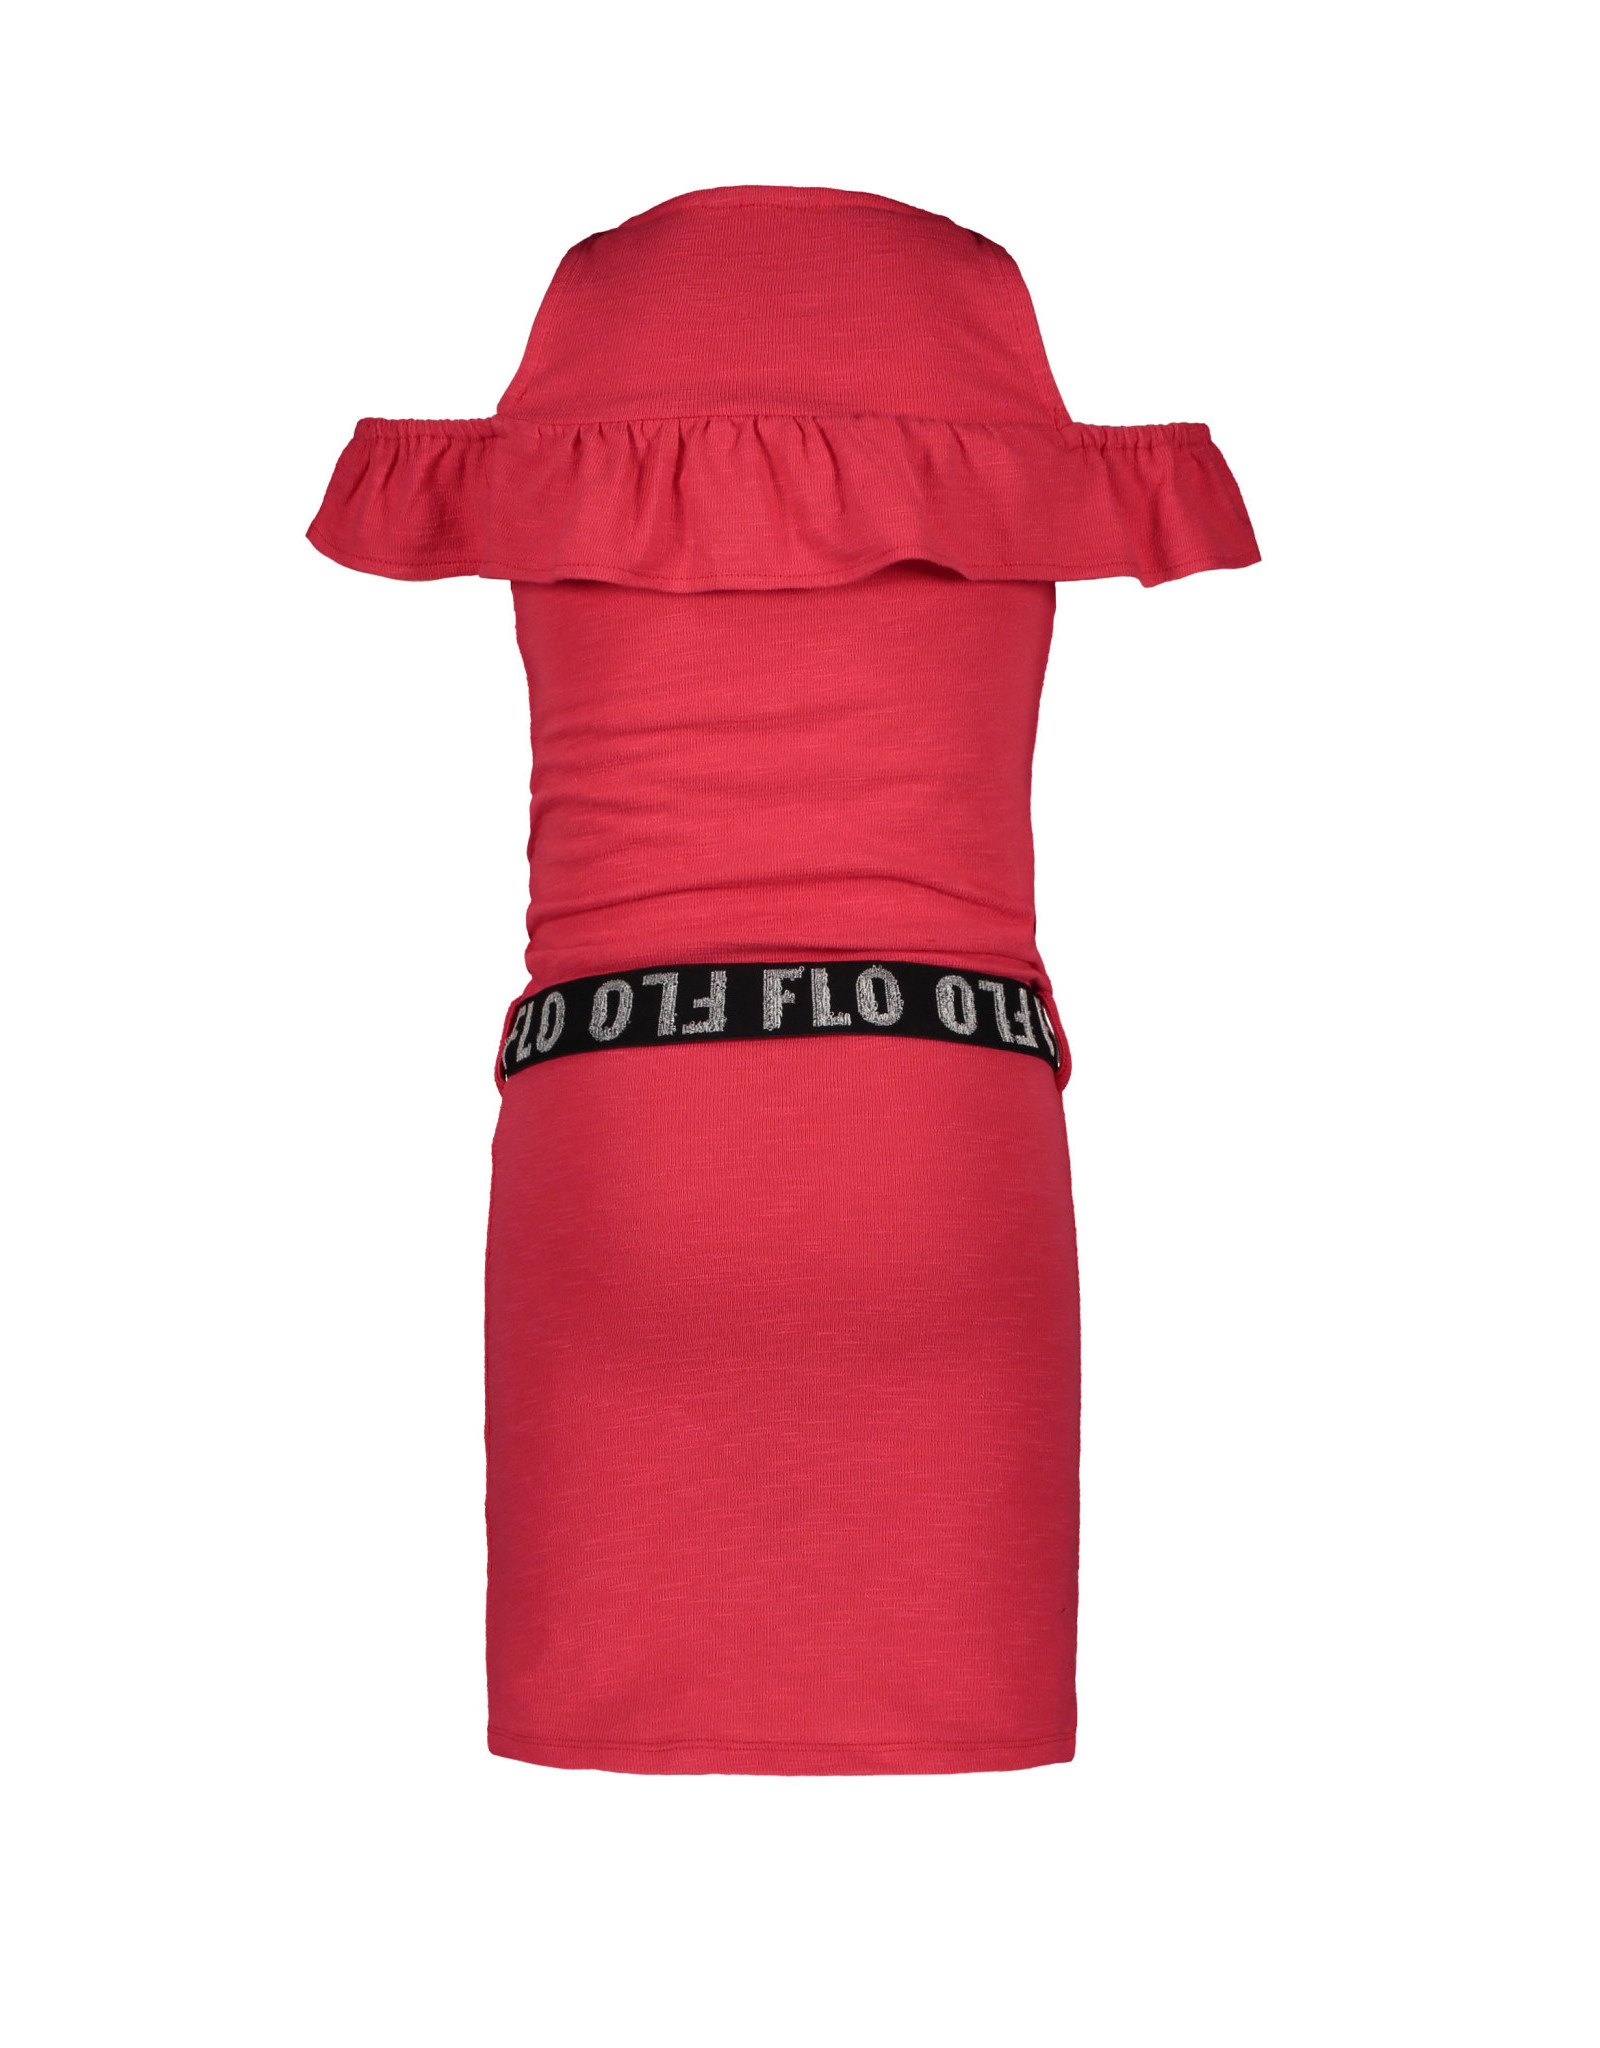 Like Flo jurk met franjes